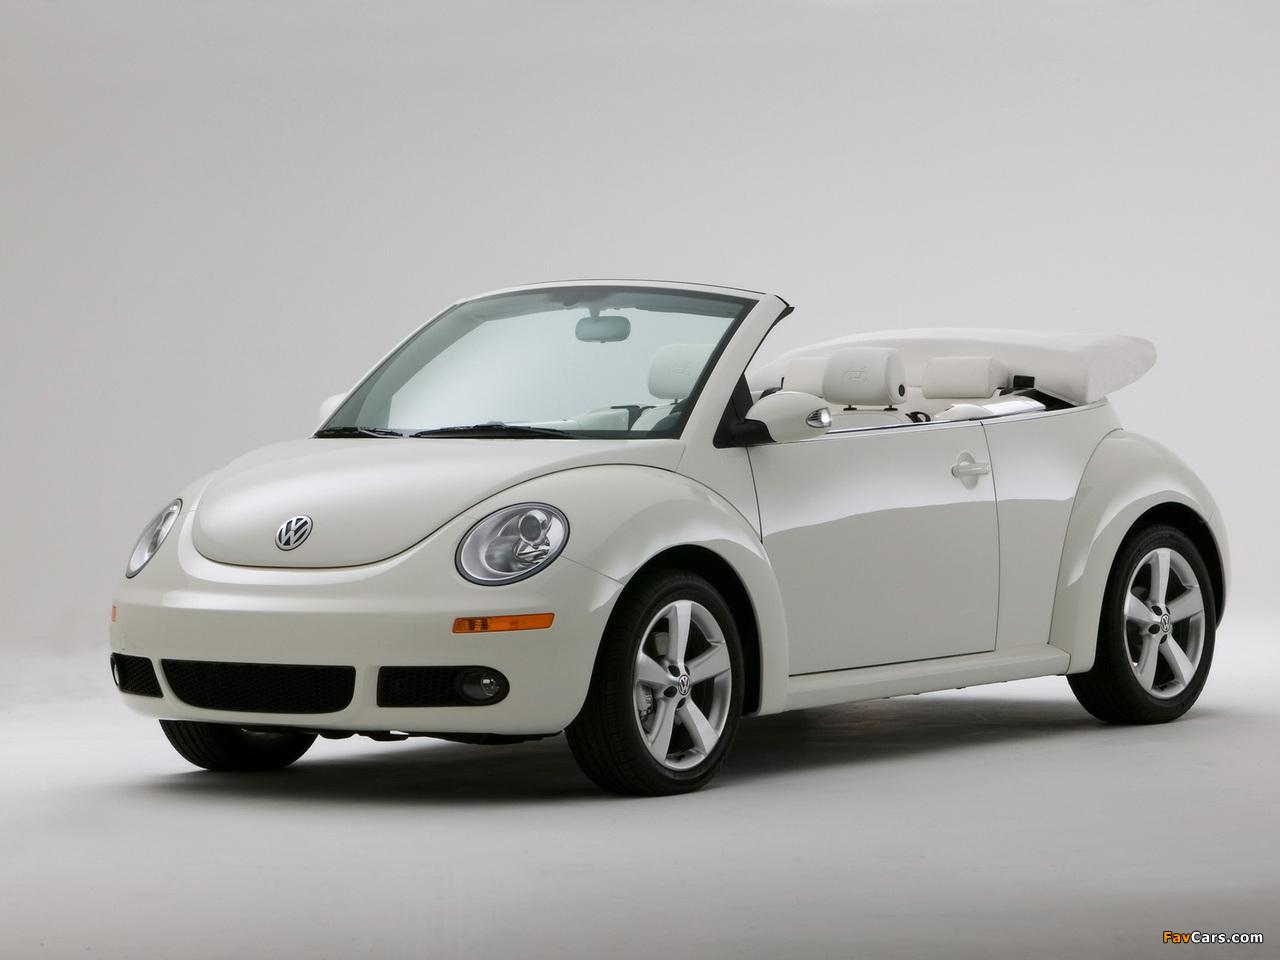 Volkswagen New Beetle Convertible Triple White 2007 photos (1280 x 960)